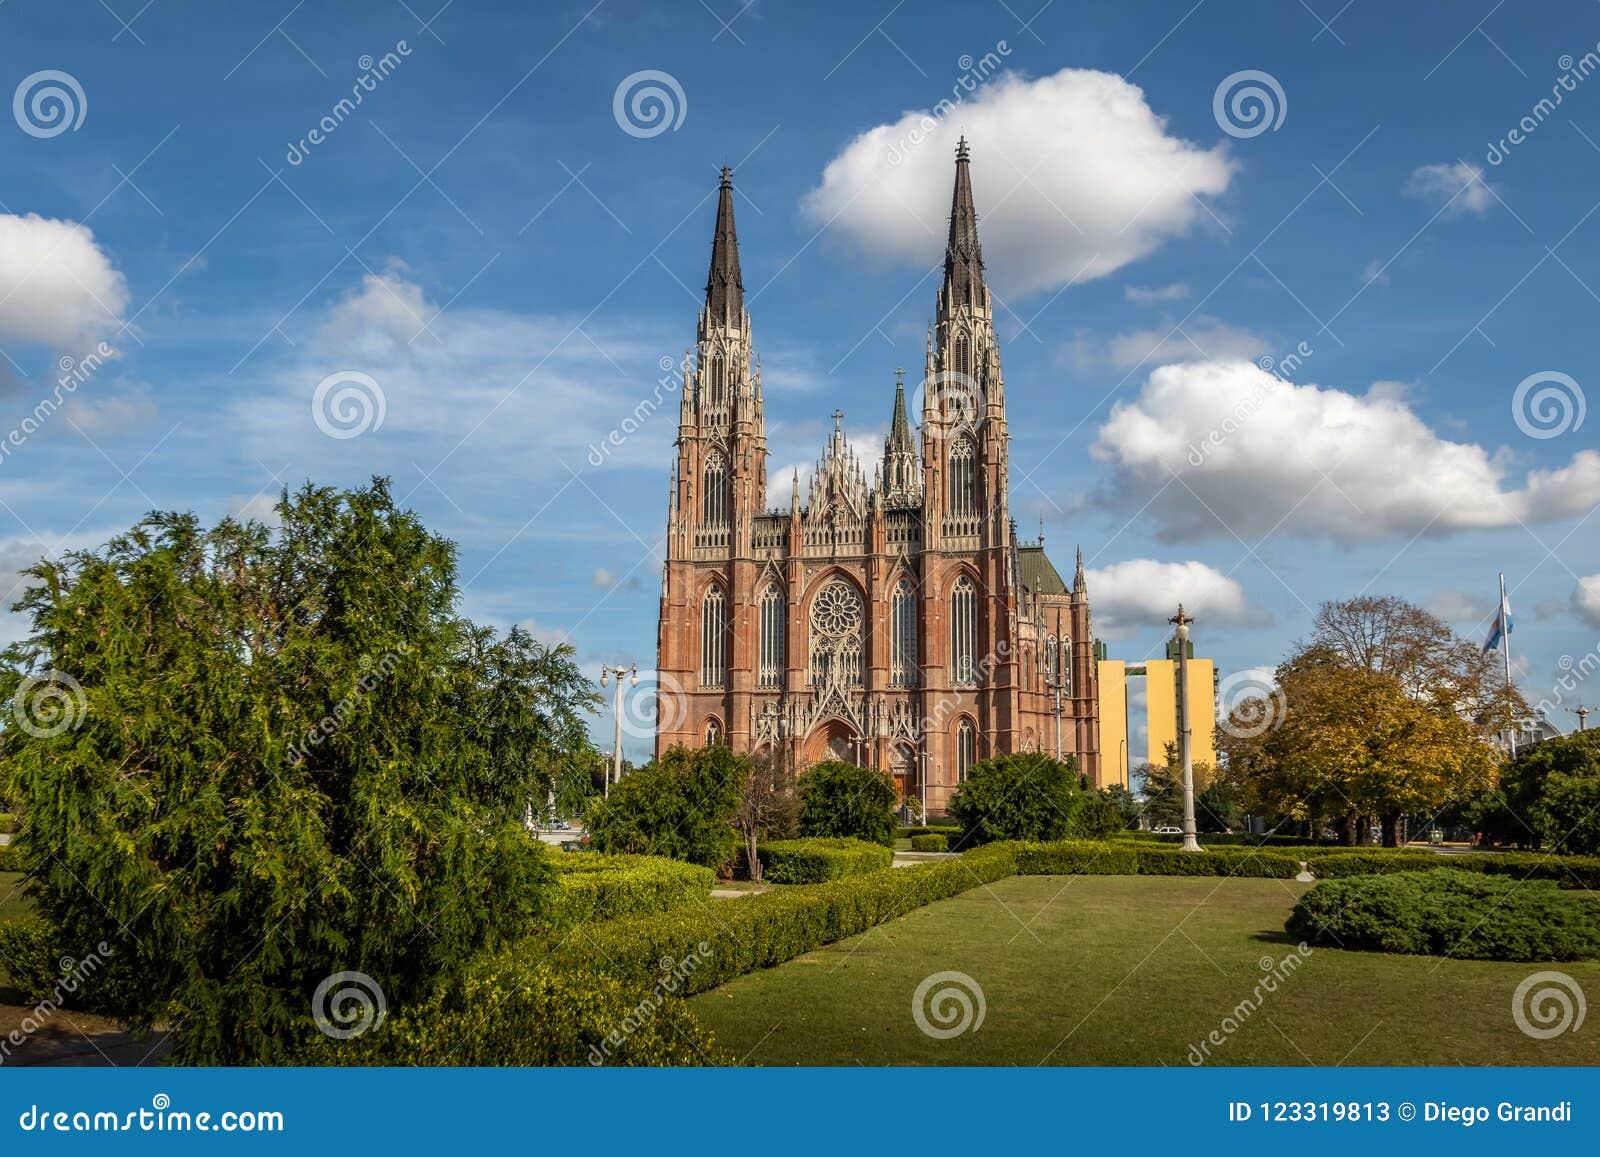 Catedral de Plata do La e plaza Moreno - La Plata, província de Buenos Aires, Argentina